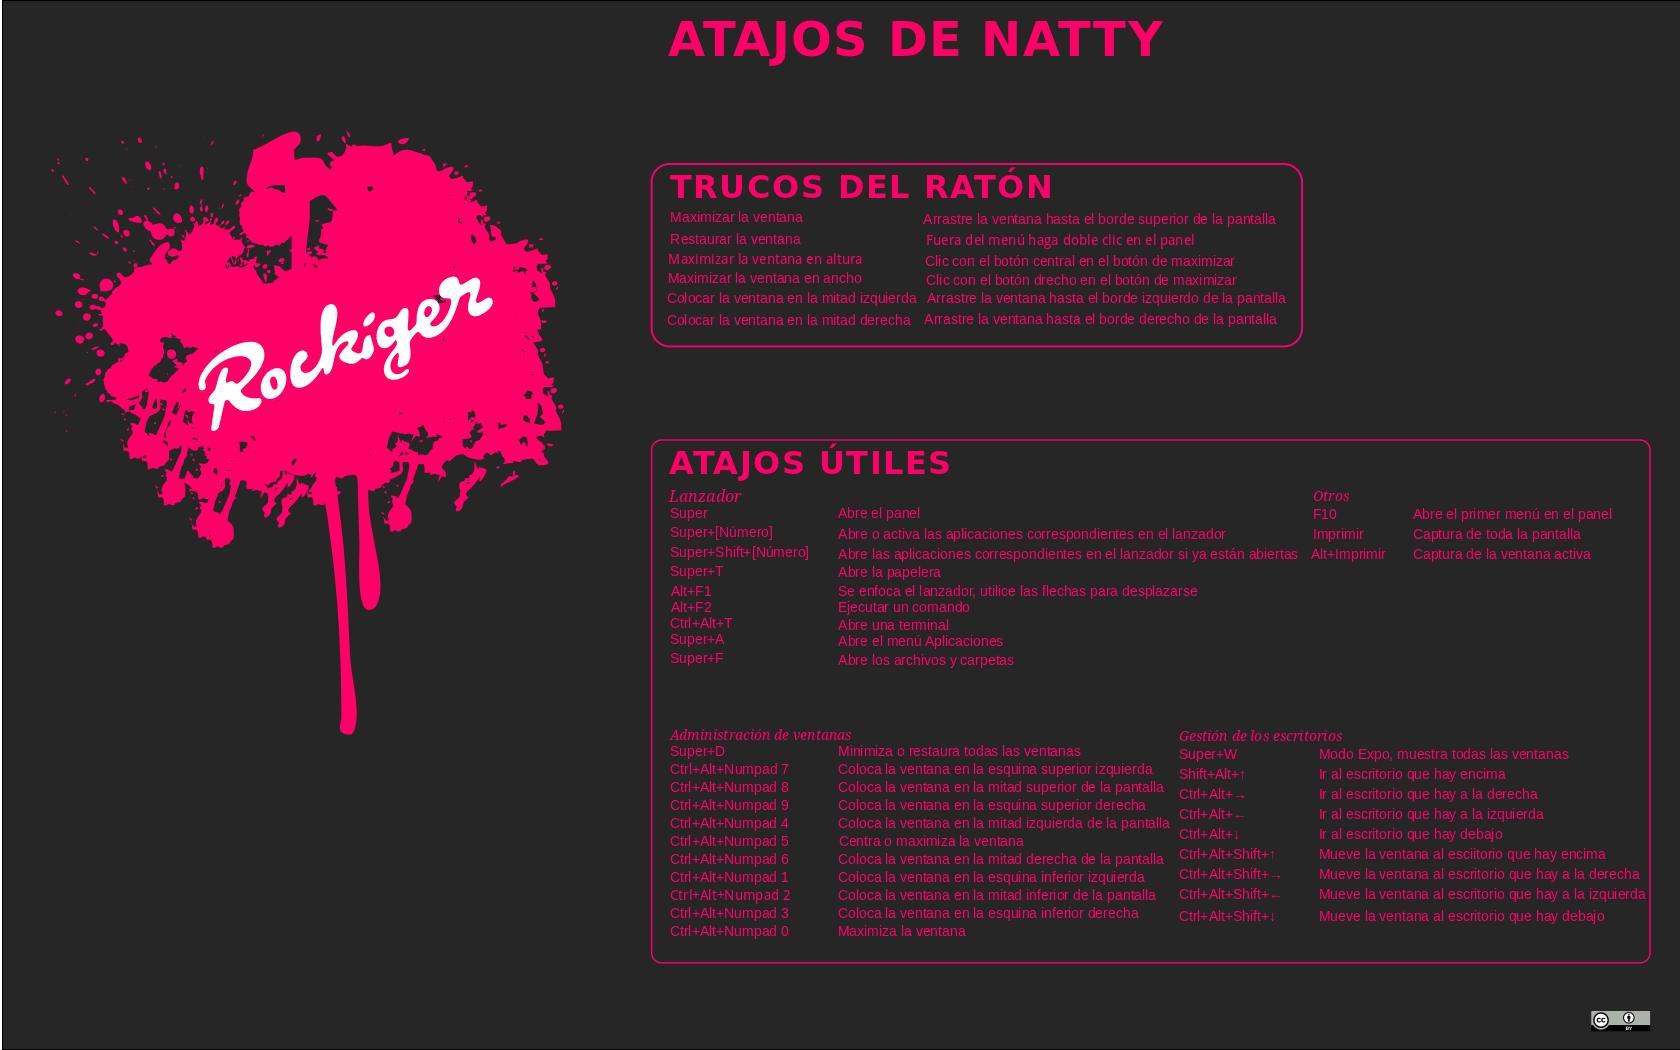 Atajos de Natty 1